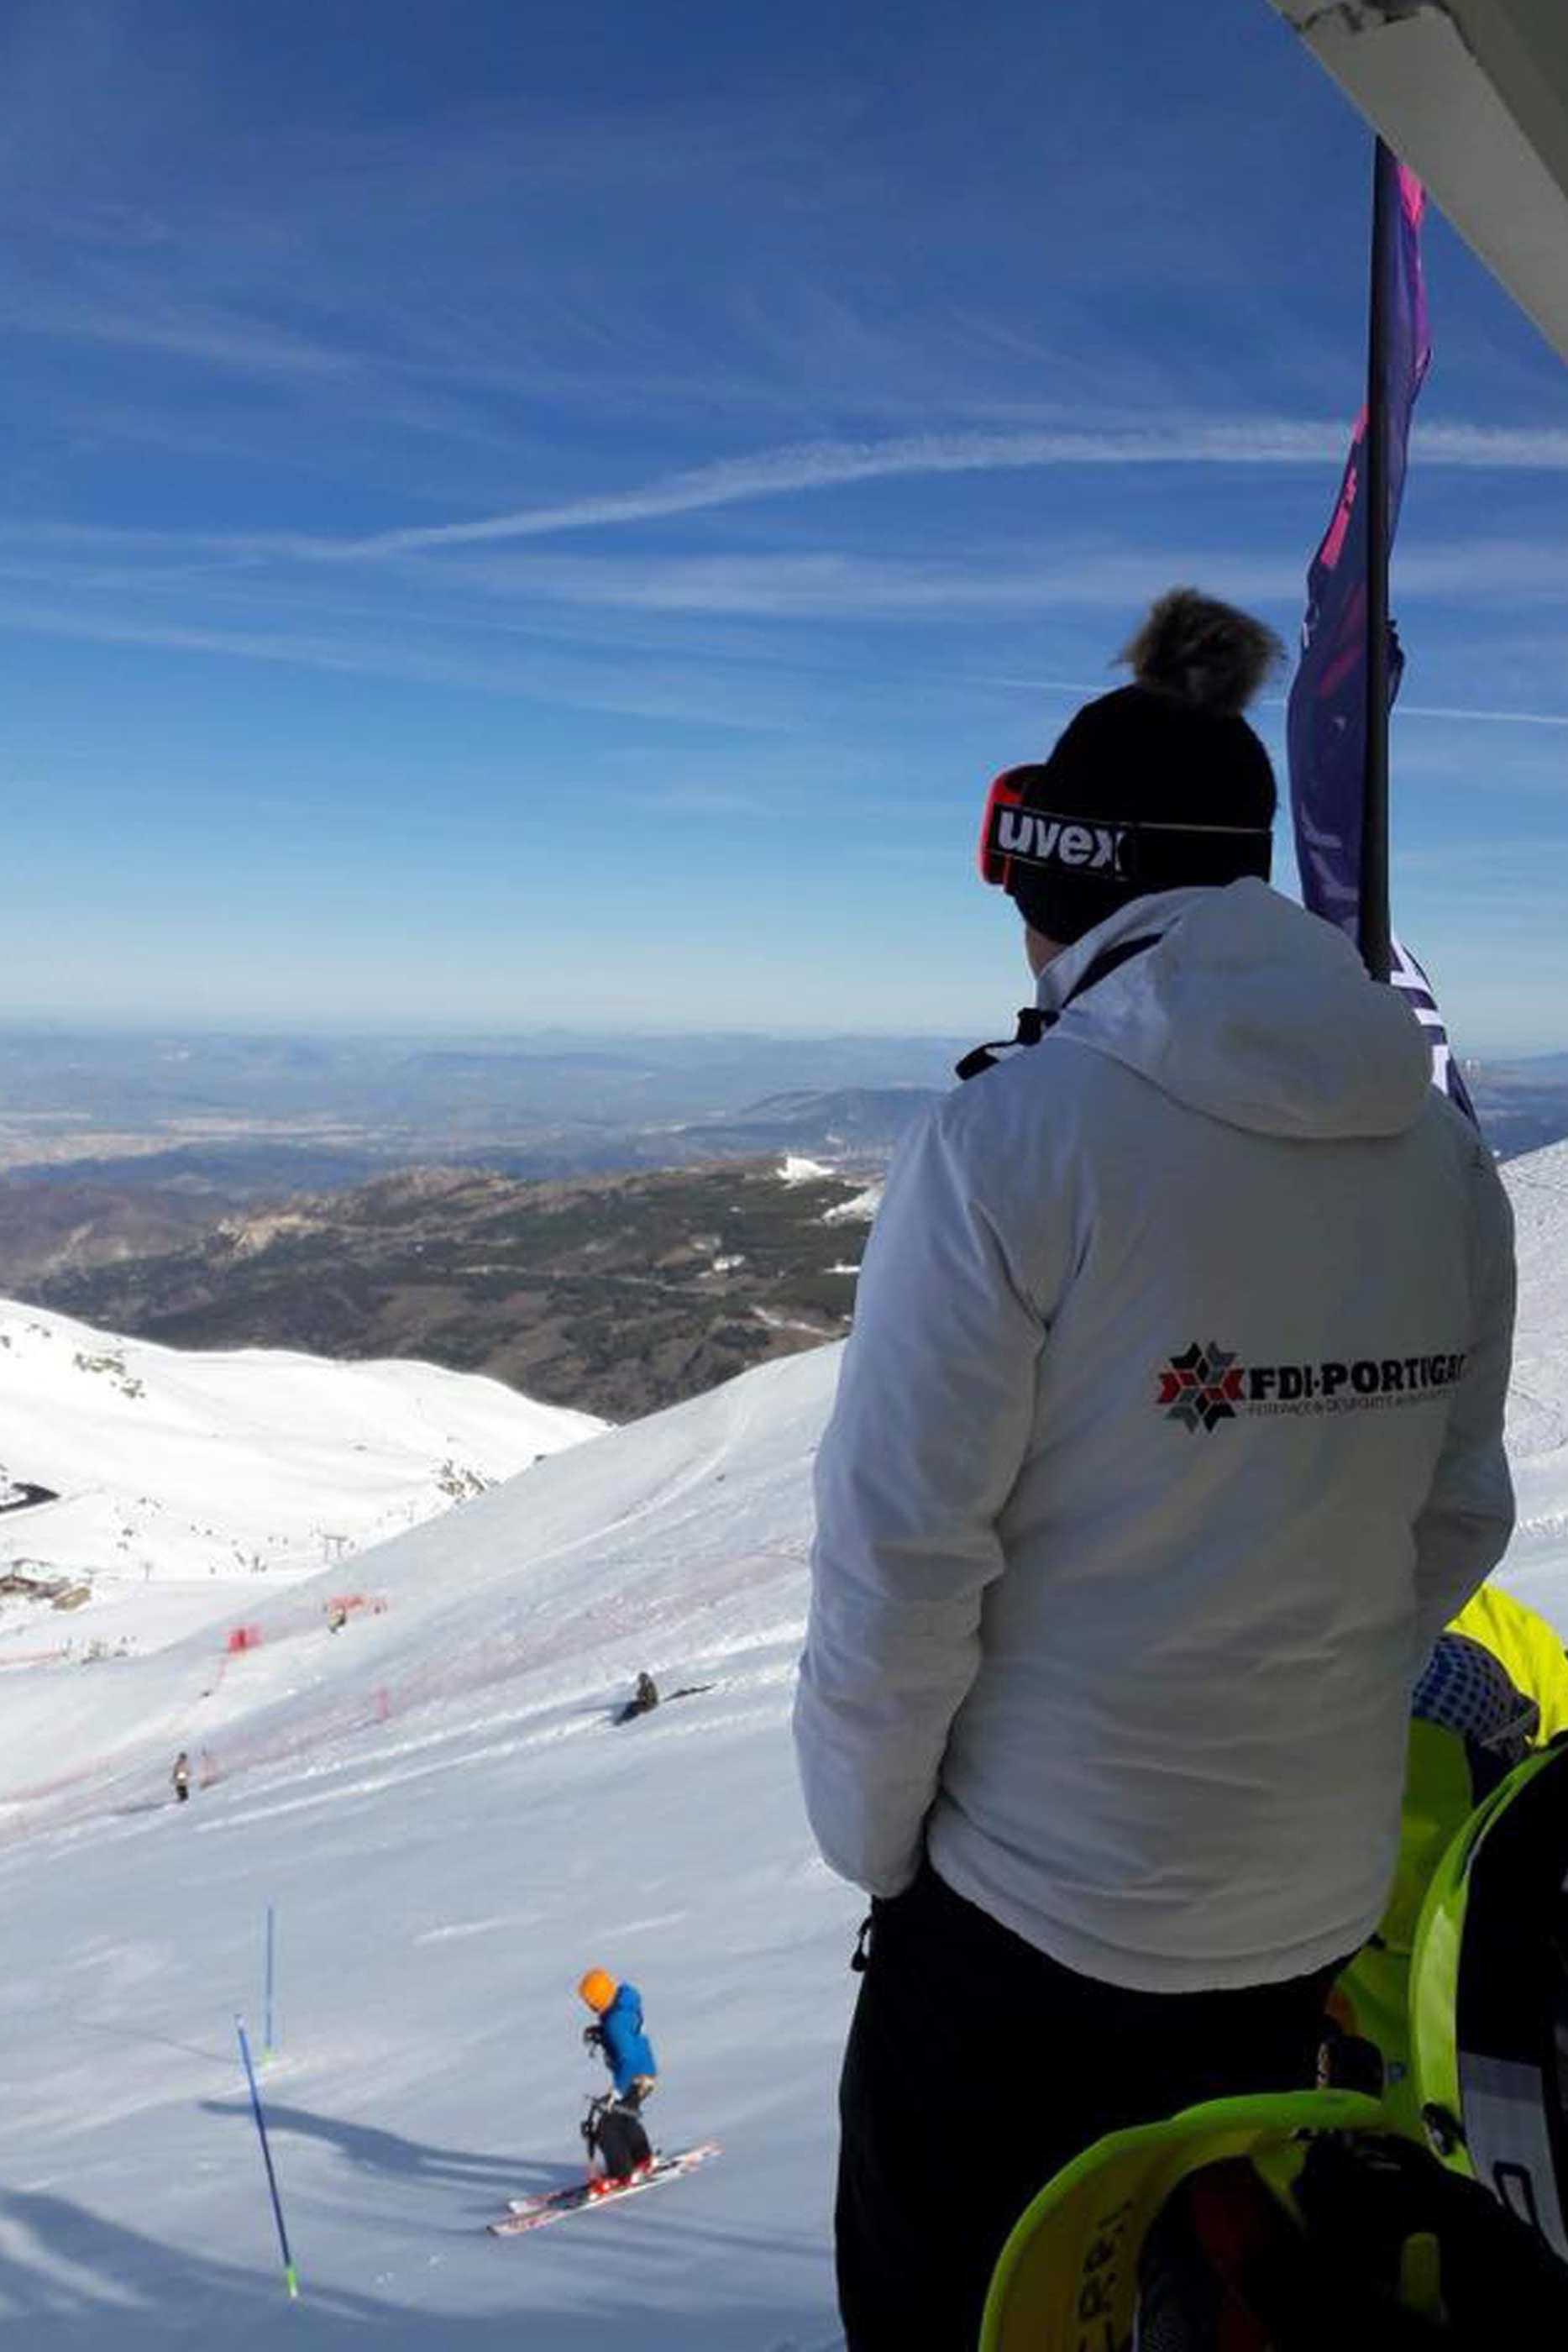 Membro da FDI-Portugal, durante a prova FIS em Serra Nevada.